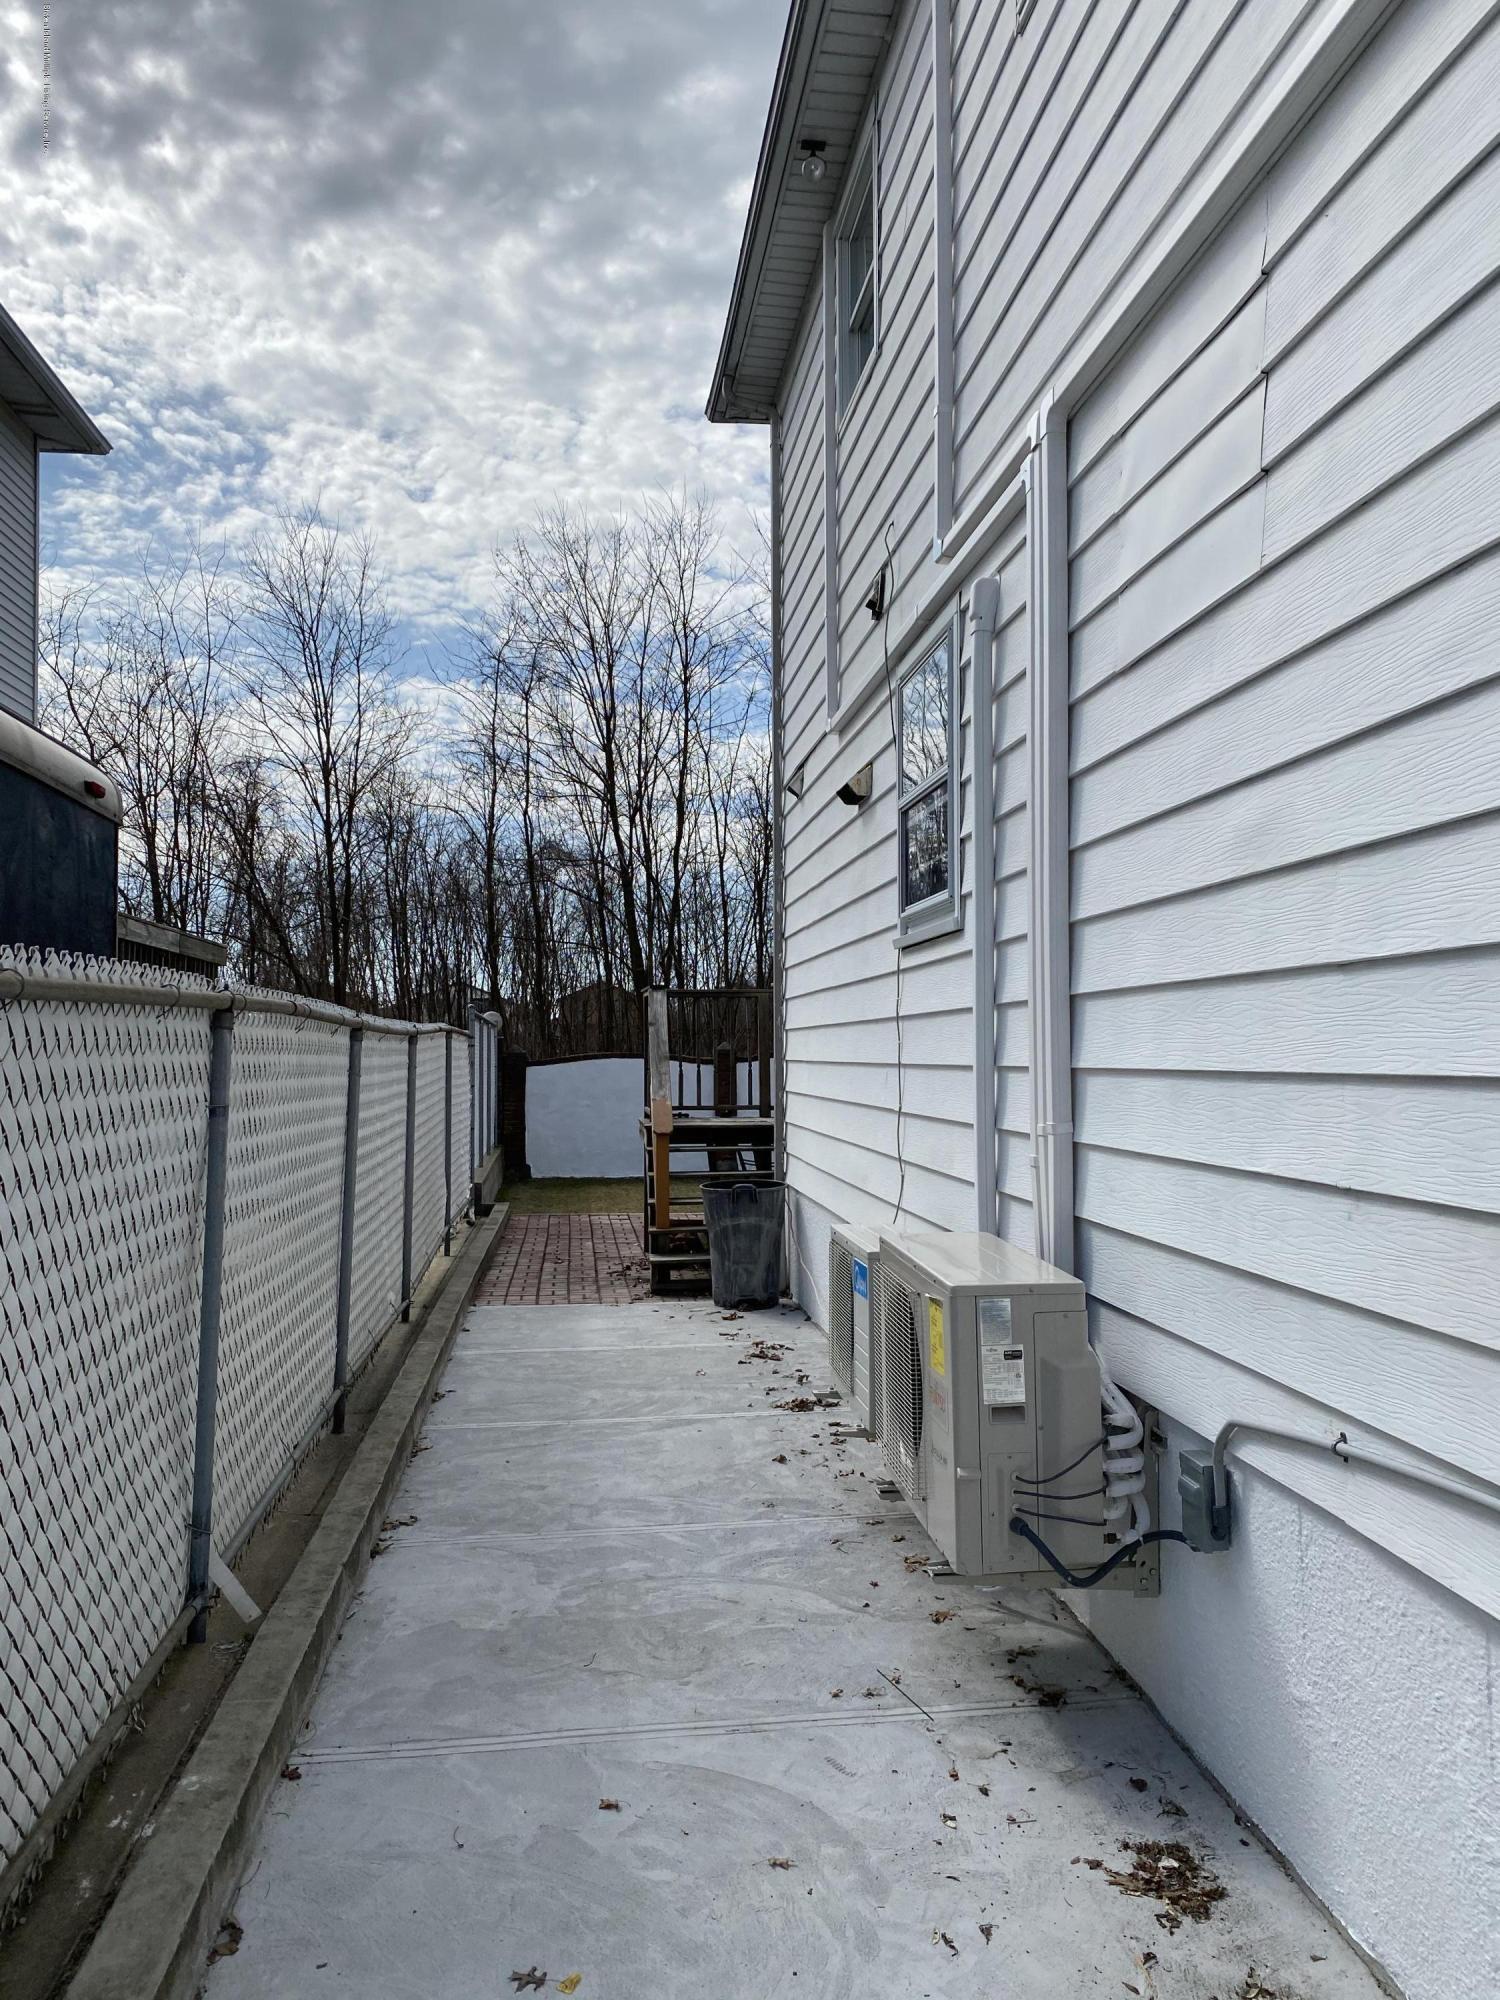 Single Family - Semi-Attached 370 Seaver Avenue  Staten Island, NY 10305, MLS-1136339-28